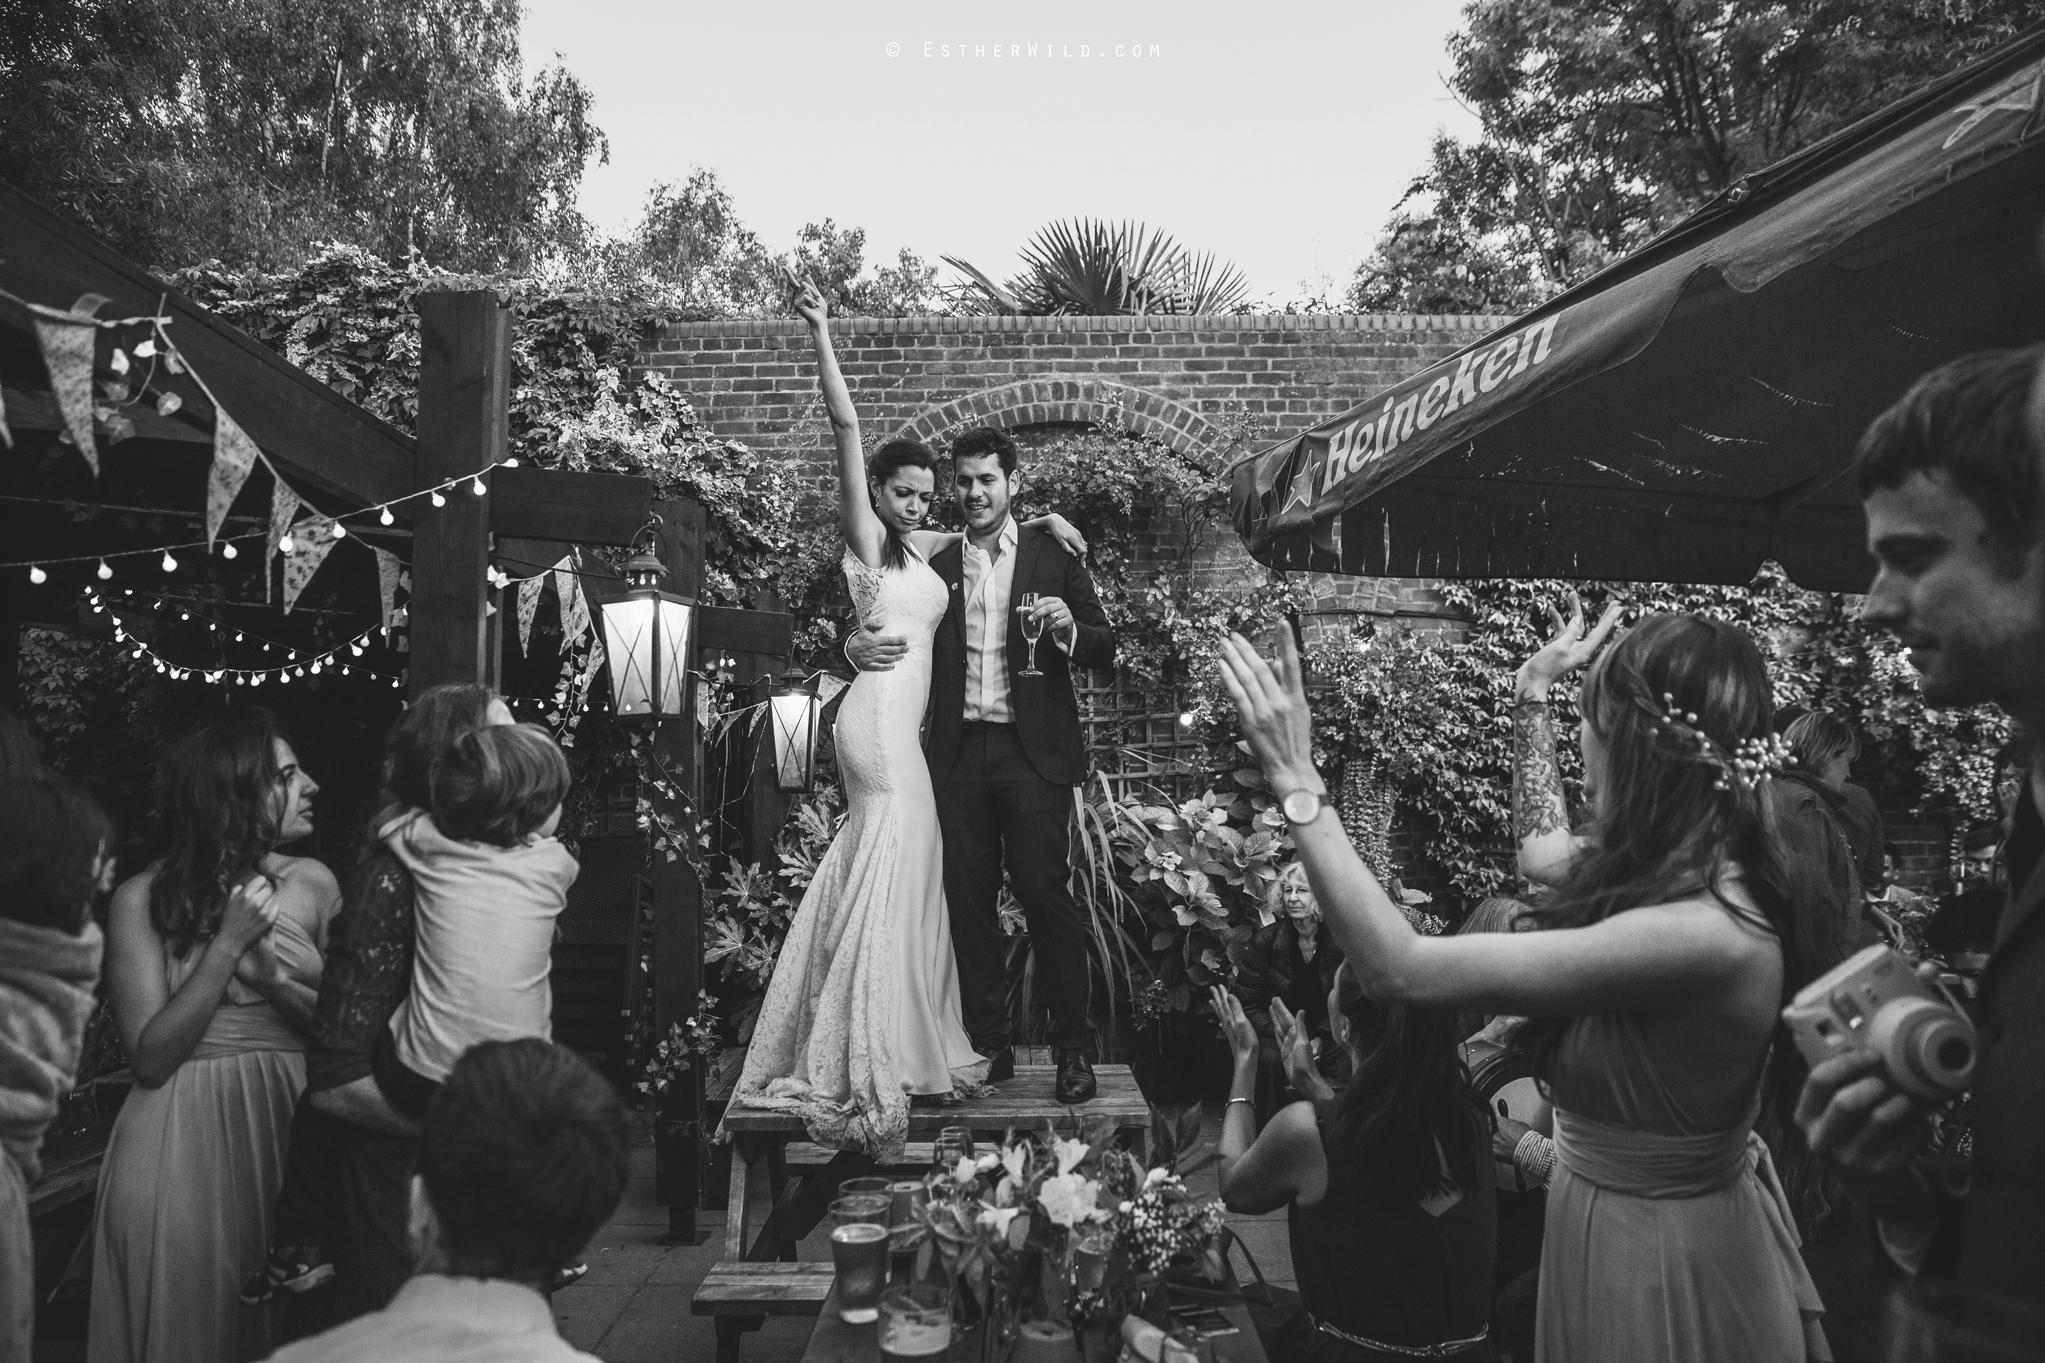 Islington_Town_Hall_Wedding_London_Photographer_Esther_Wild_IMG_7837-1.jpg